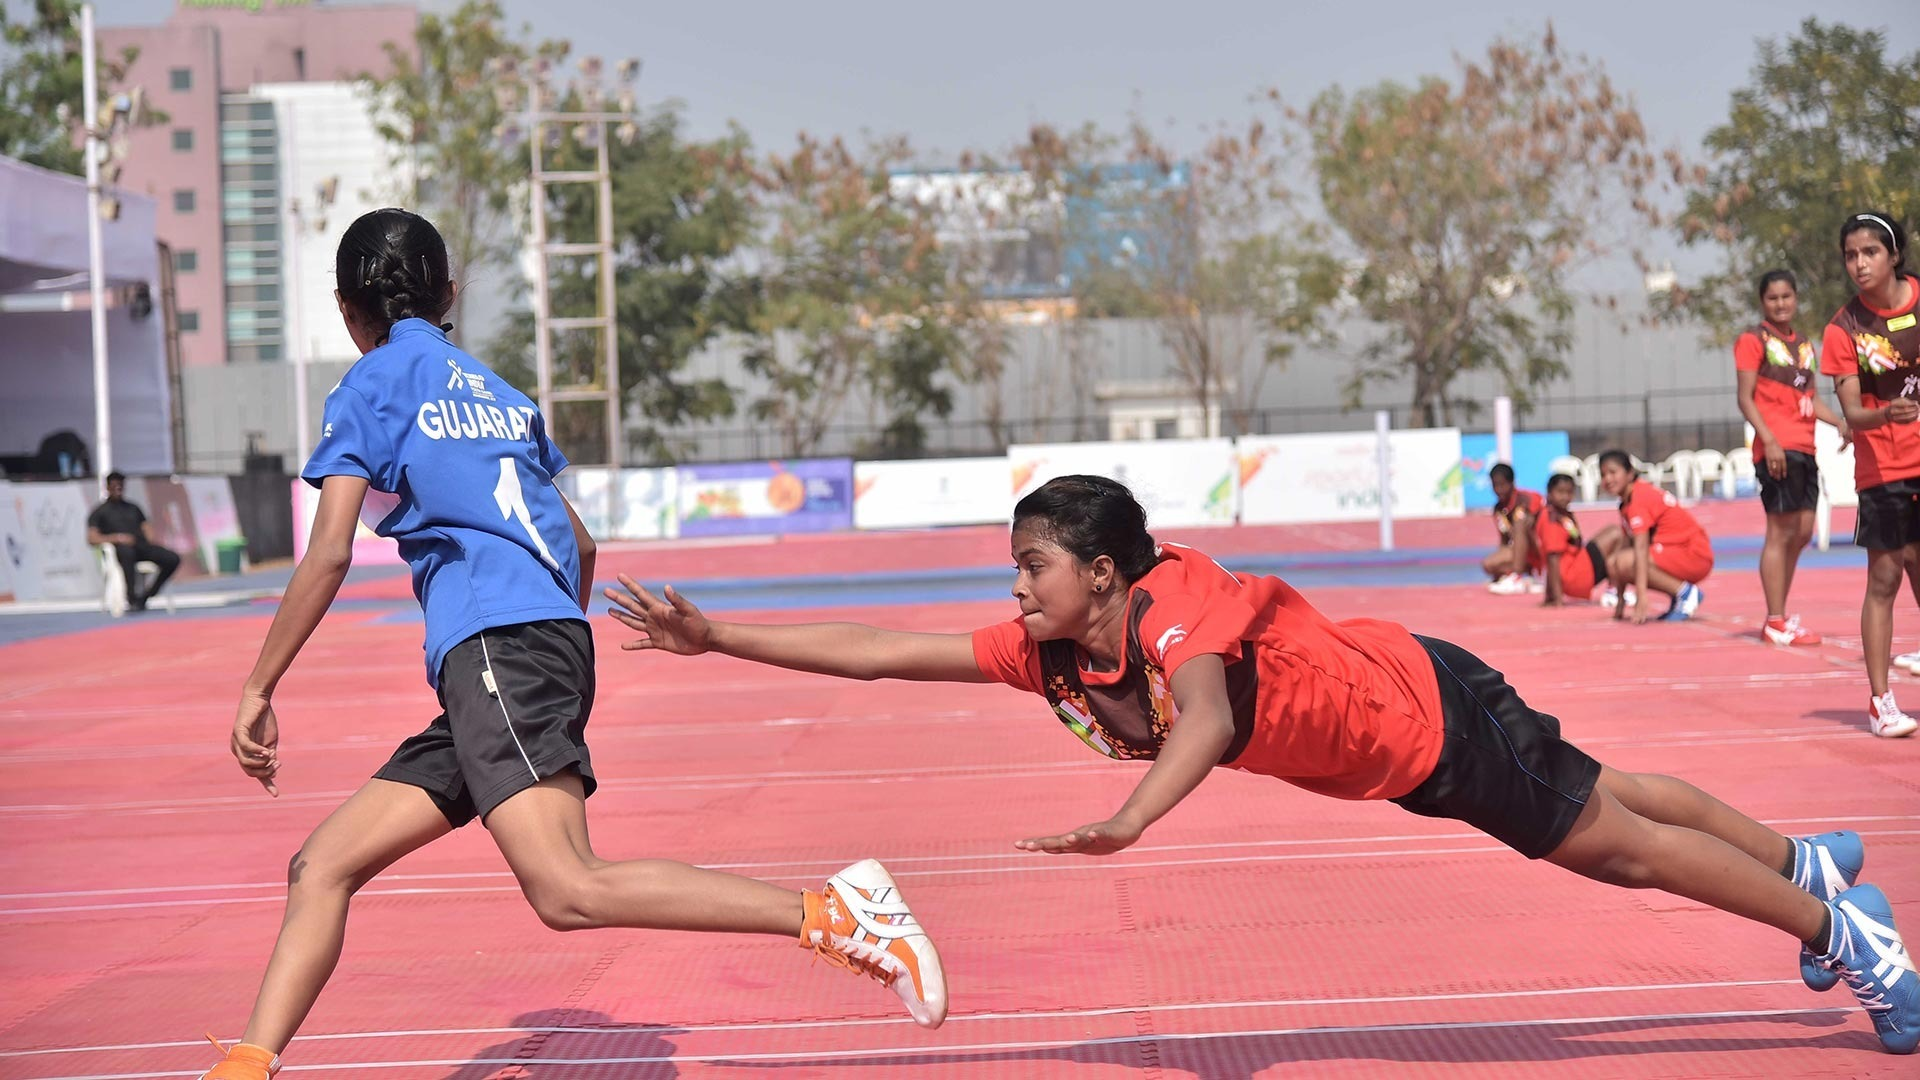 Khelo India, Youth Games, Maharashtra, medal tally, News Mobile, News Mobile India